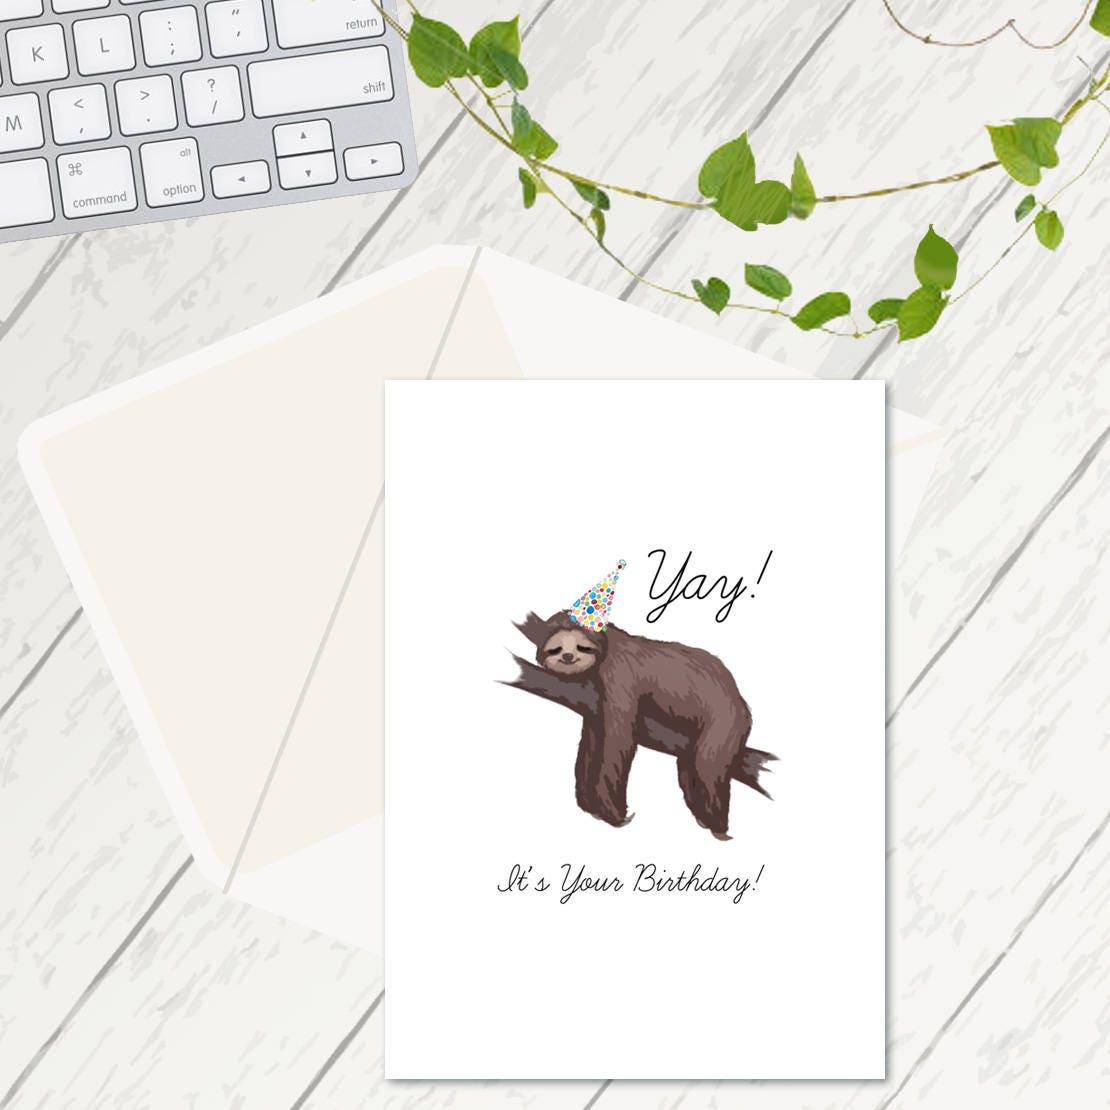 Yay Its Your Birthday Birthday Cards Sloth Birthday Card Sloth